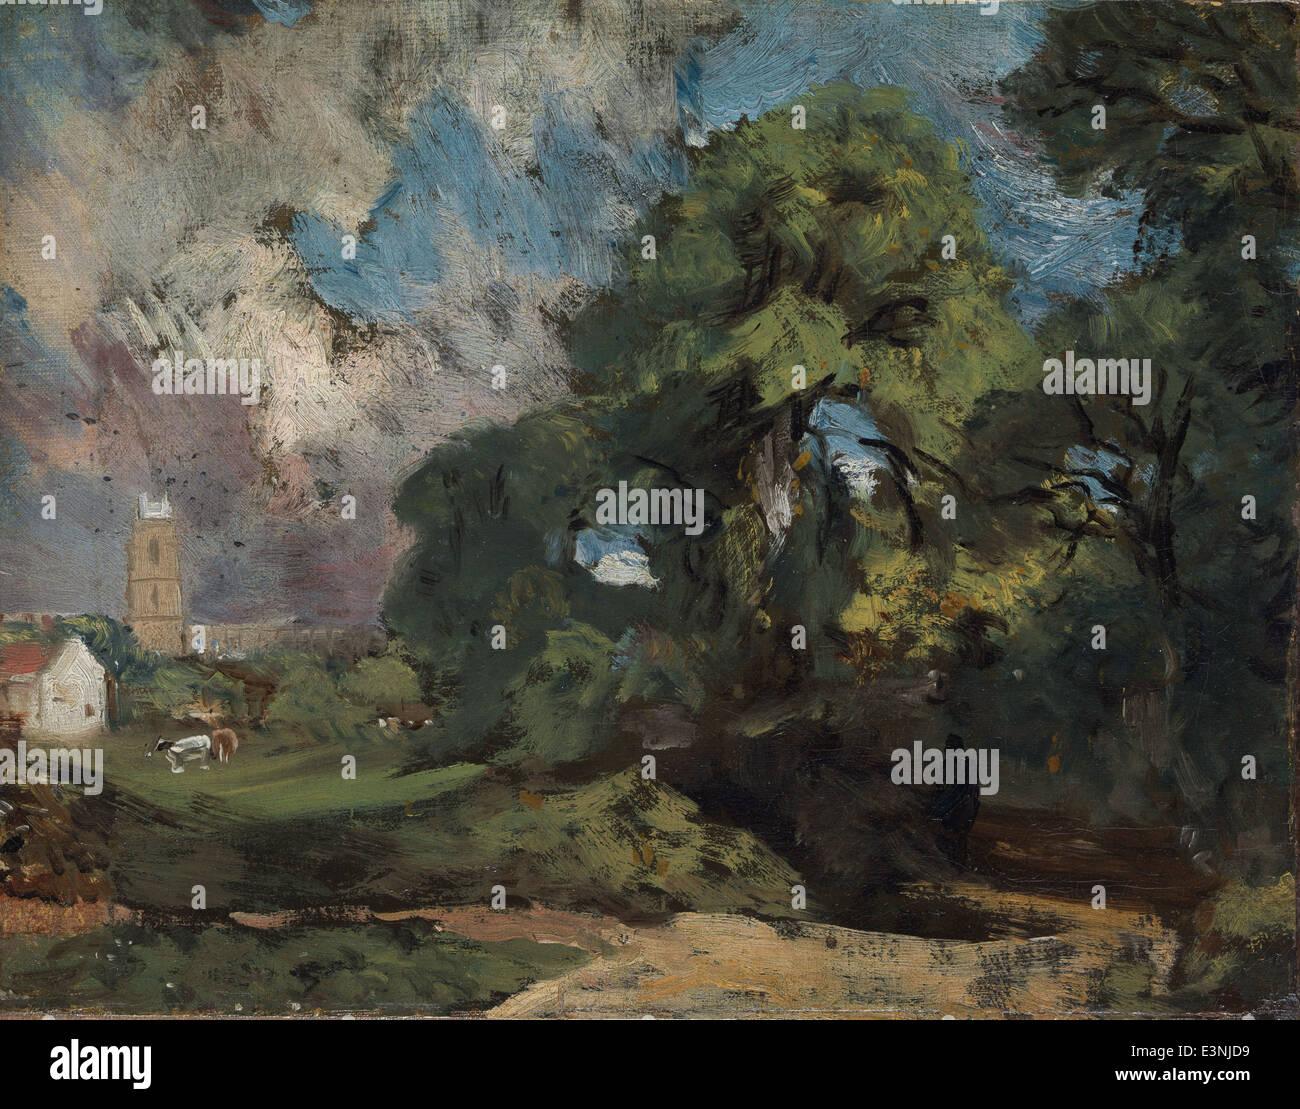 John Constable - Stoke-by-Nayland - 1811 - MET Museum - New-York - Stock Image